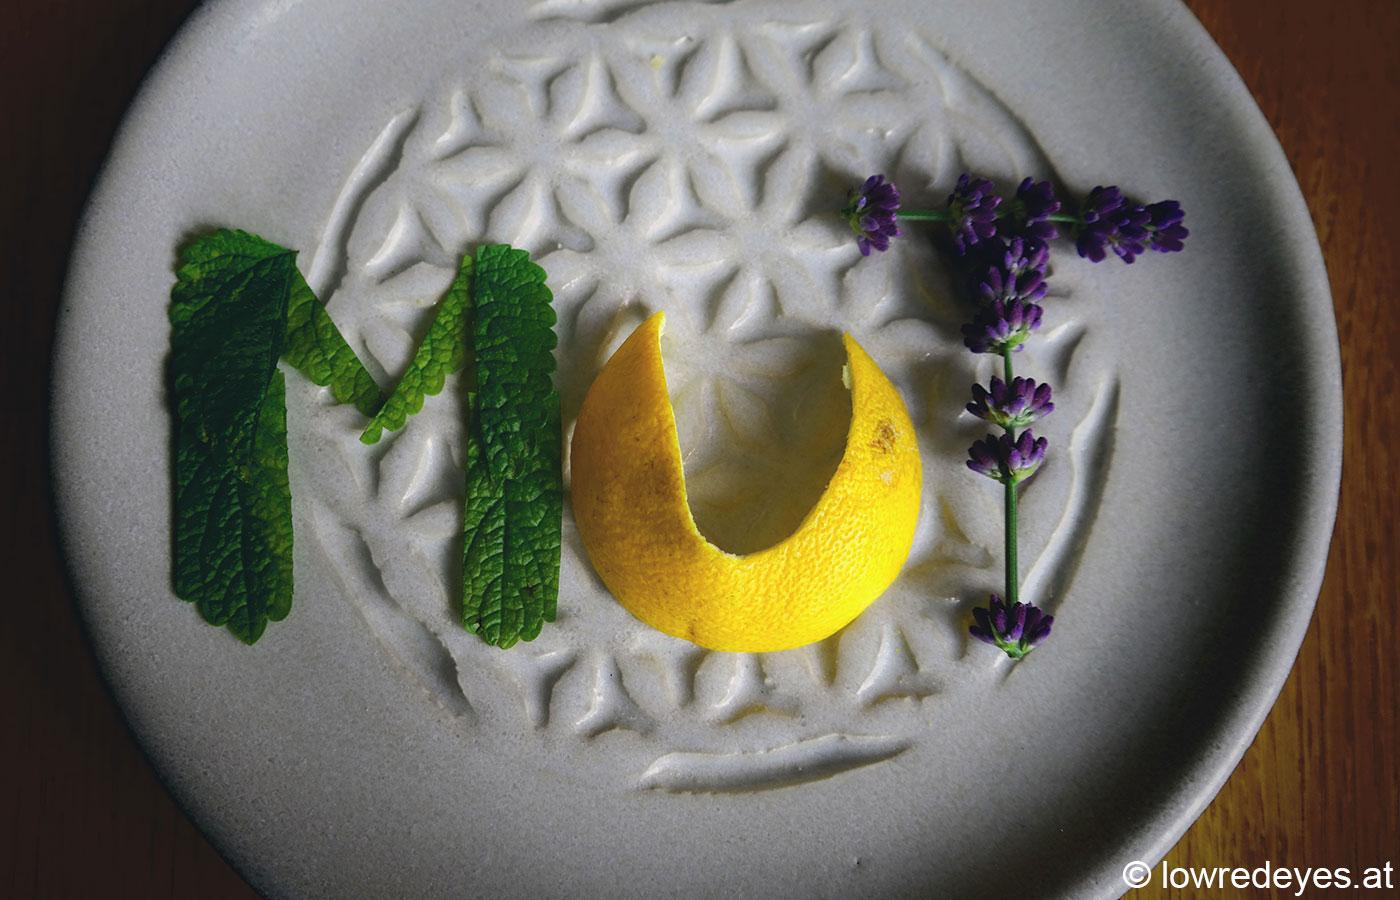 Mut-Öl zum Michaeli-Tag: Johanniskraut, äth. Öle (Mandarine, Melisse und Lavendel) - gemeinsame Sache